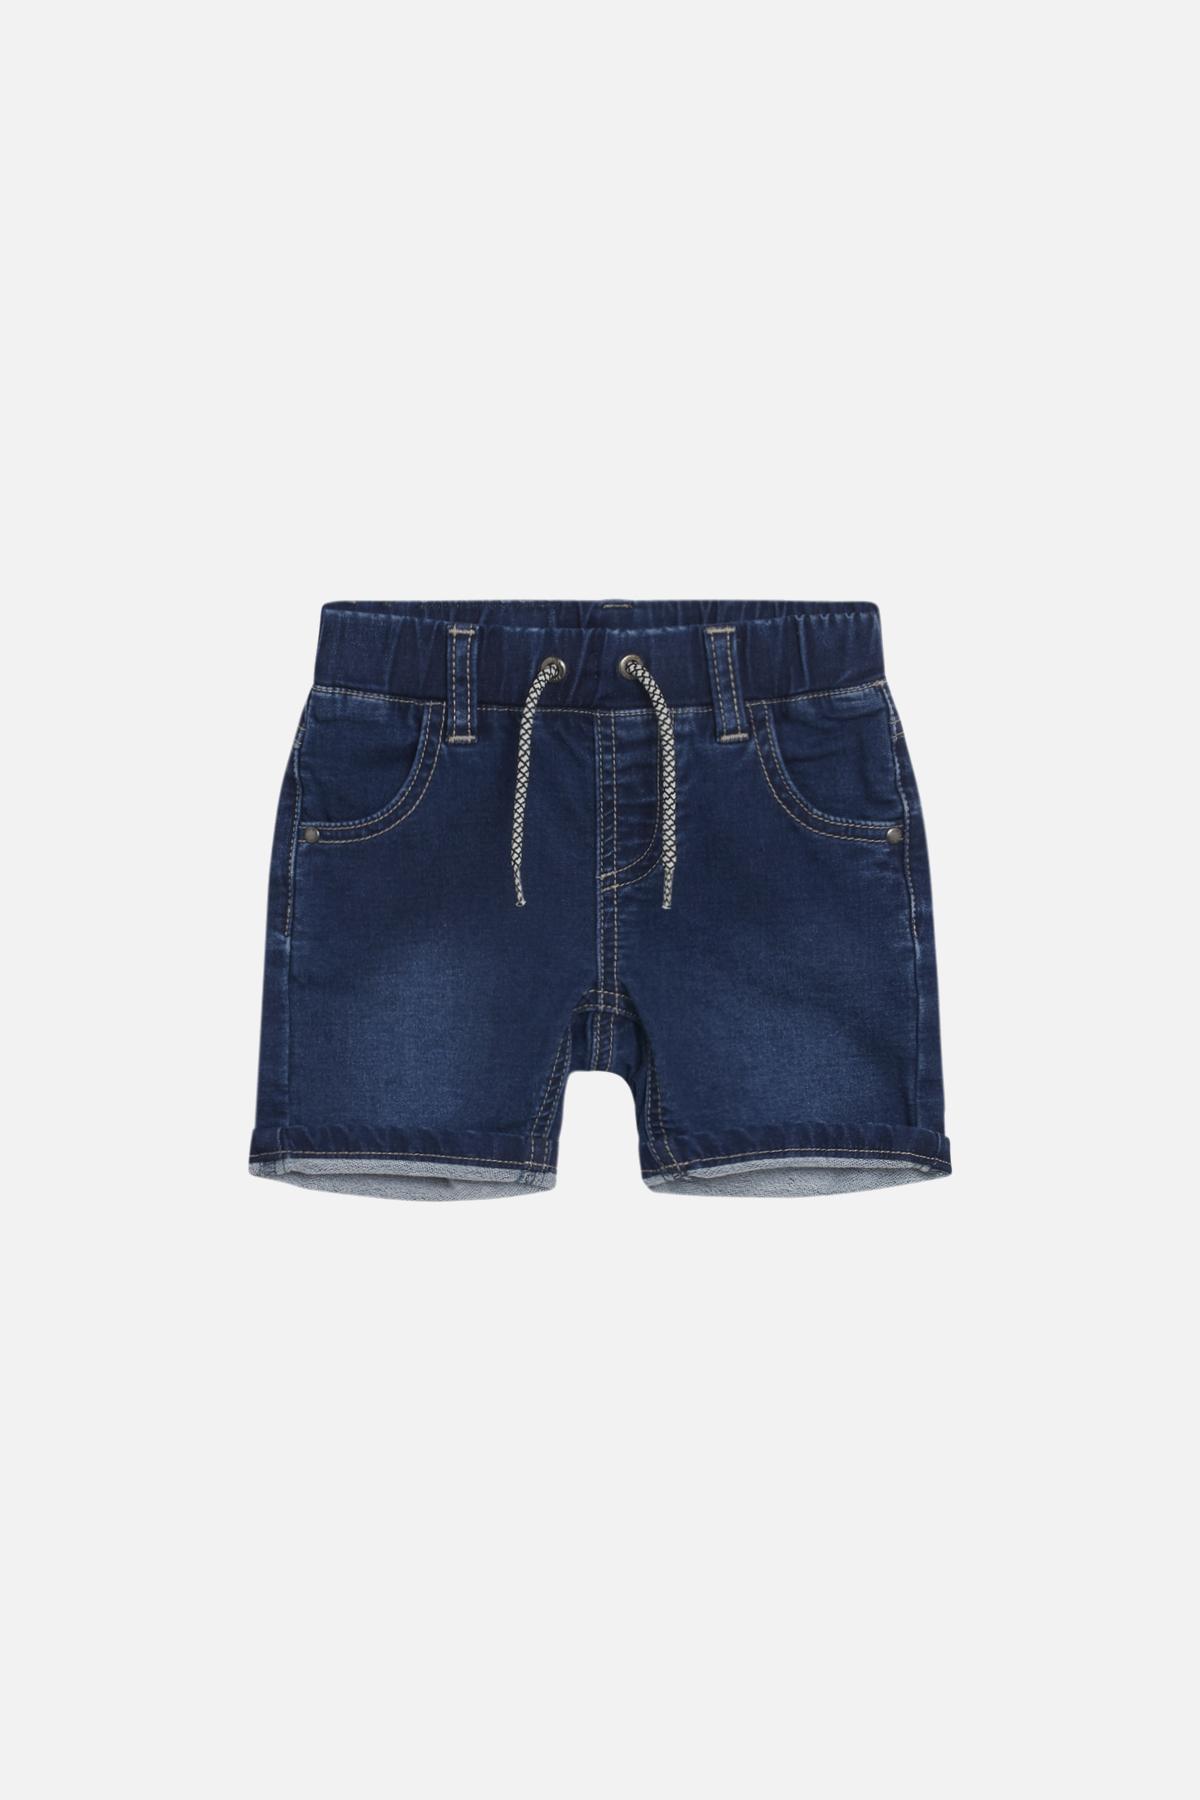 Hust & Claire Jes Bermuda shorts